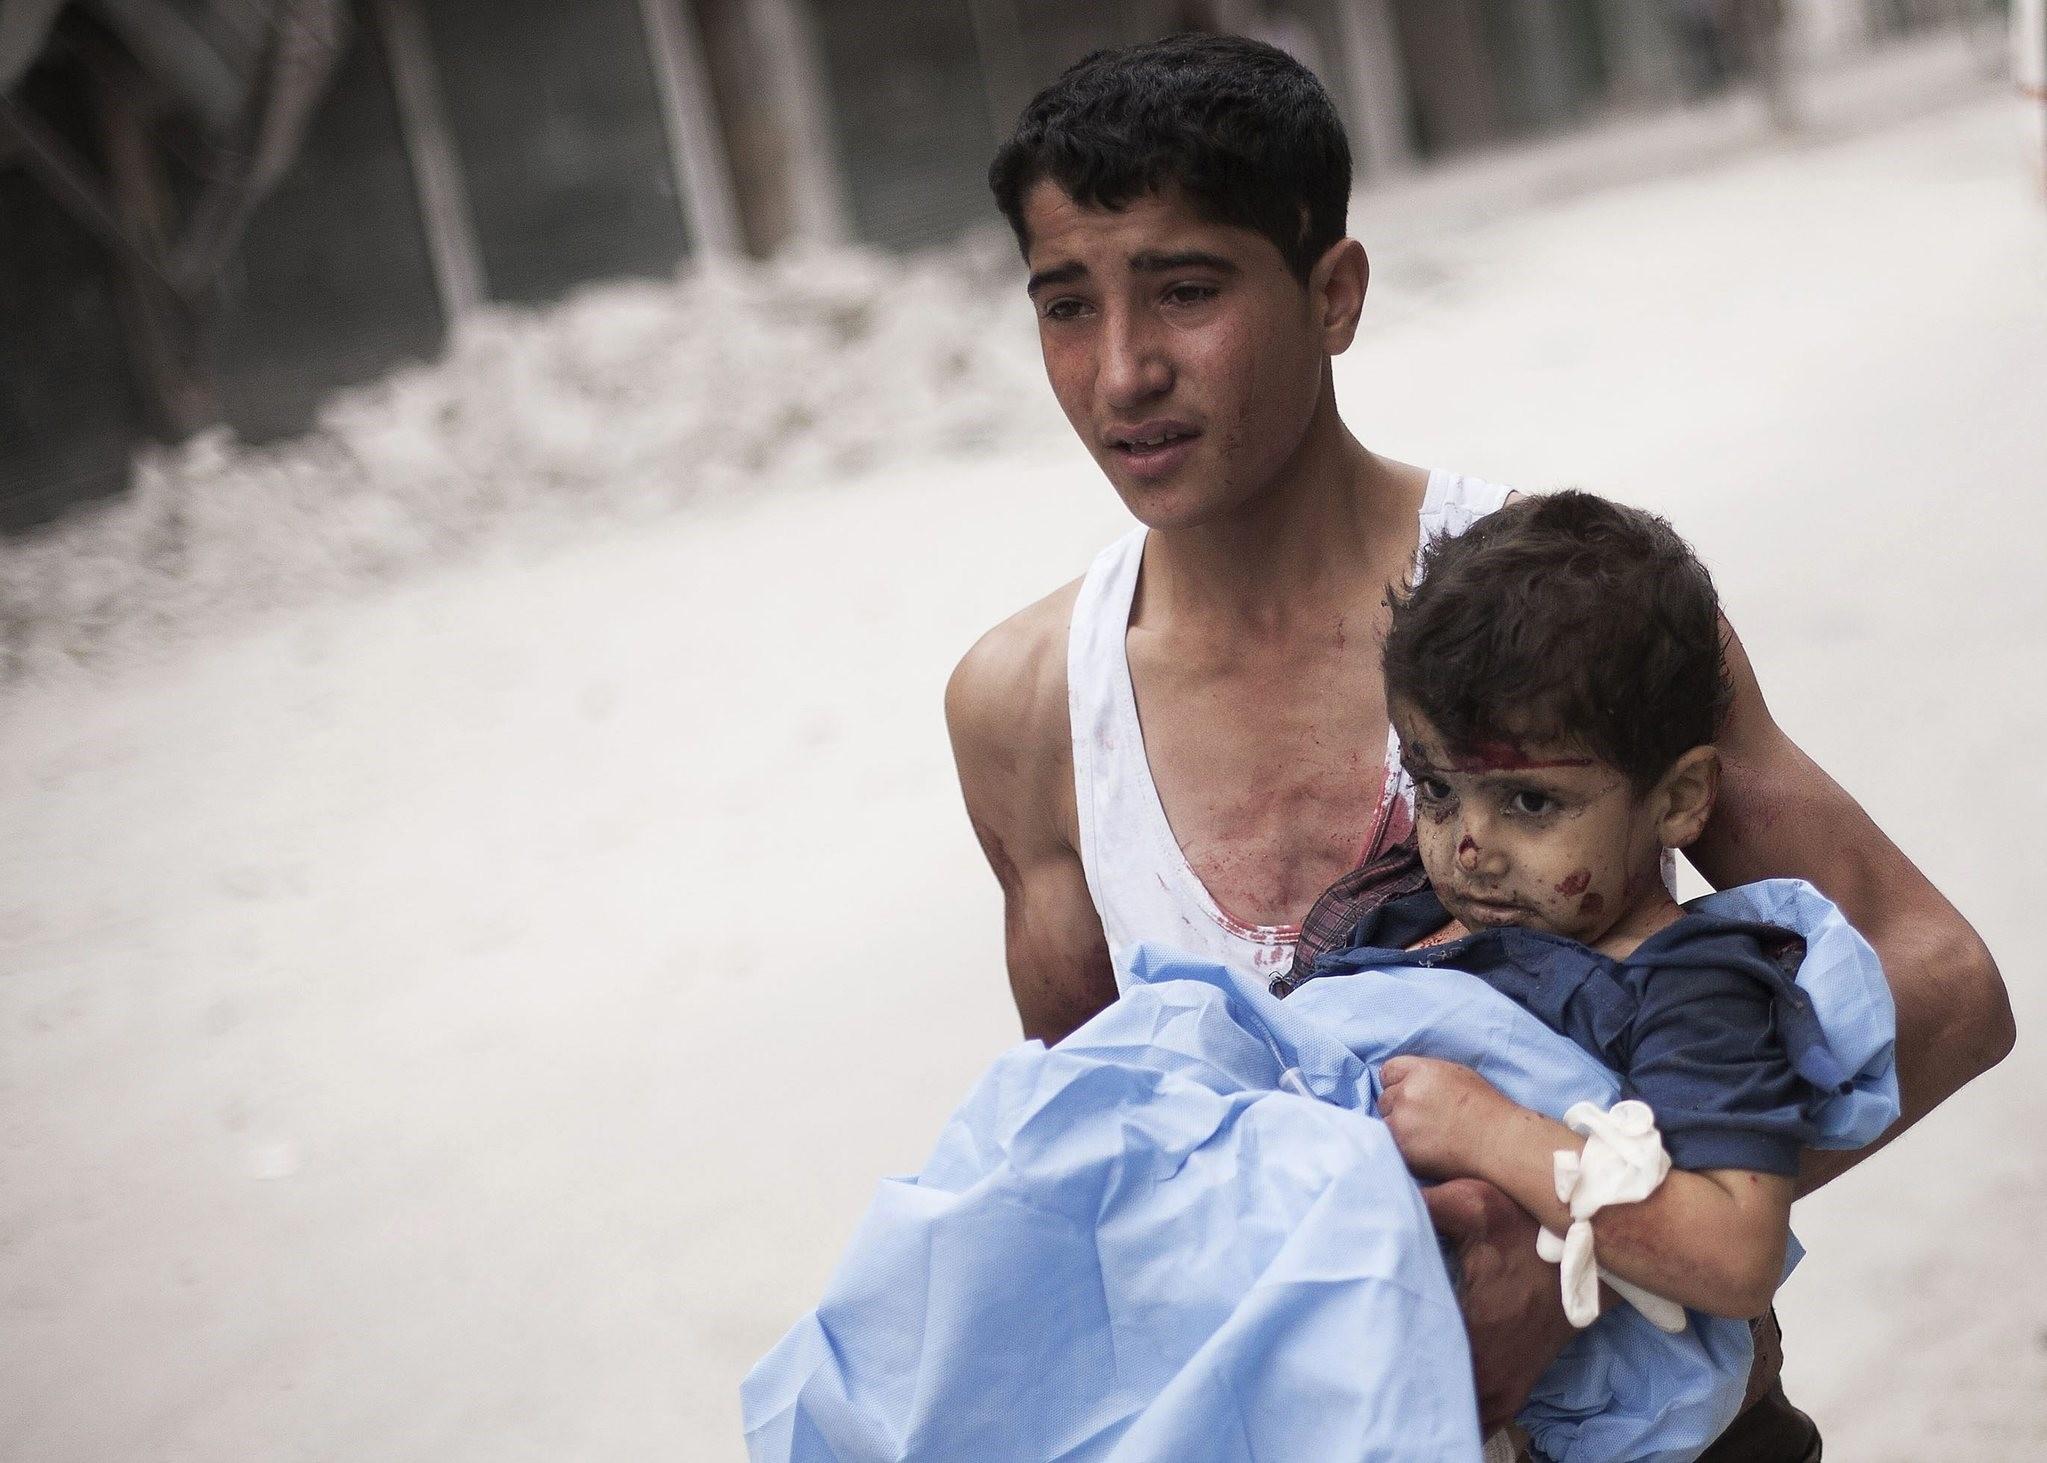 A Syrian youth holds a child wounded by Syrian Army shelling near Dar El Shifa hospital in Aleppo, Syria, Thursday, Oct. 11, 2012. (AP Photo)